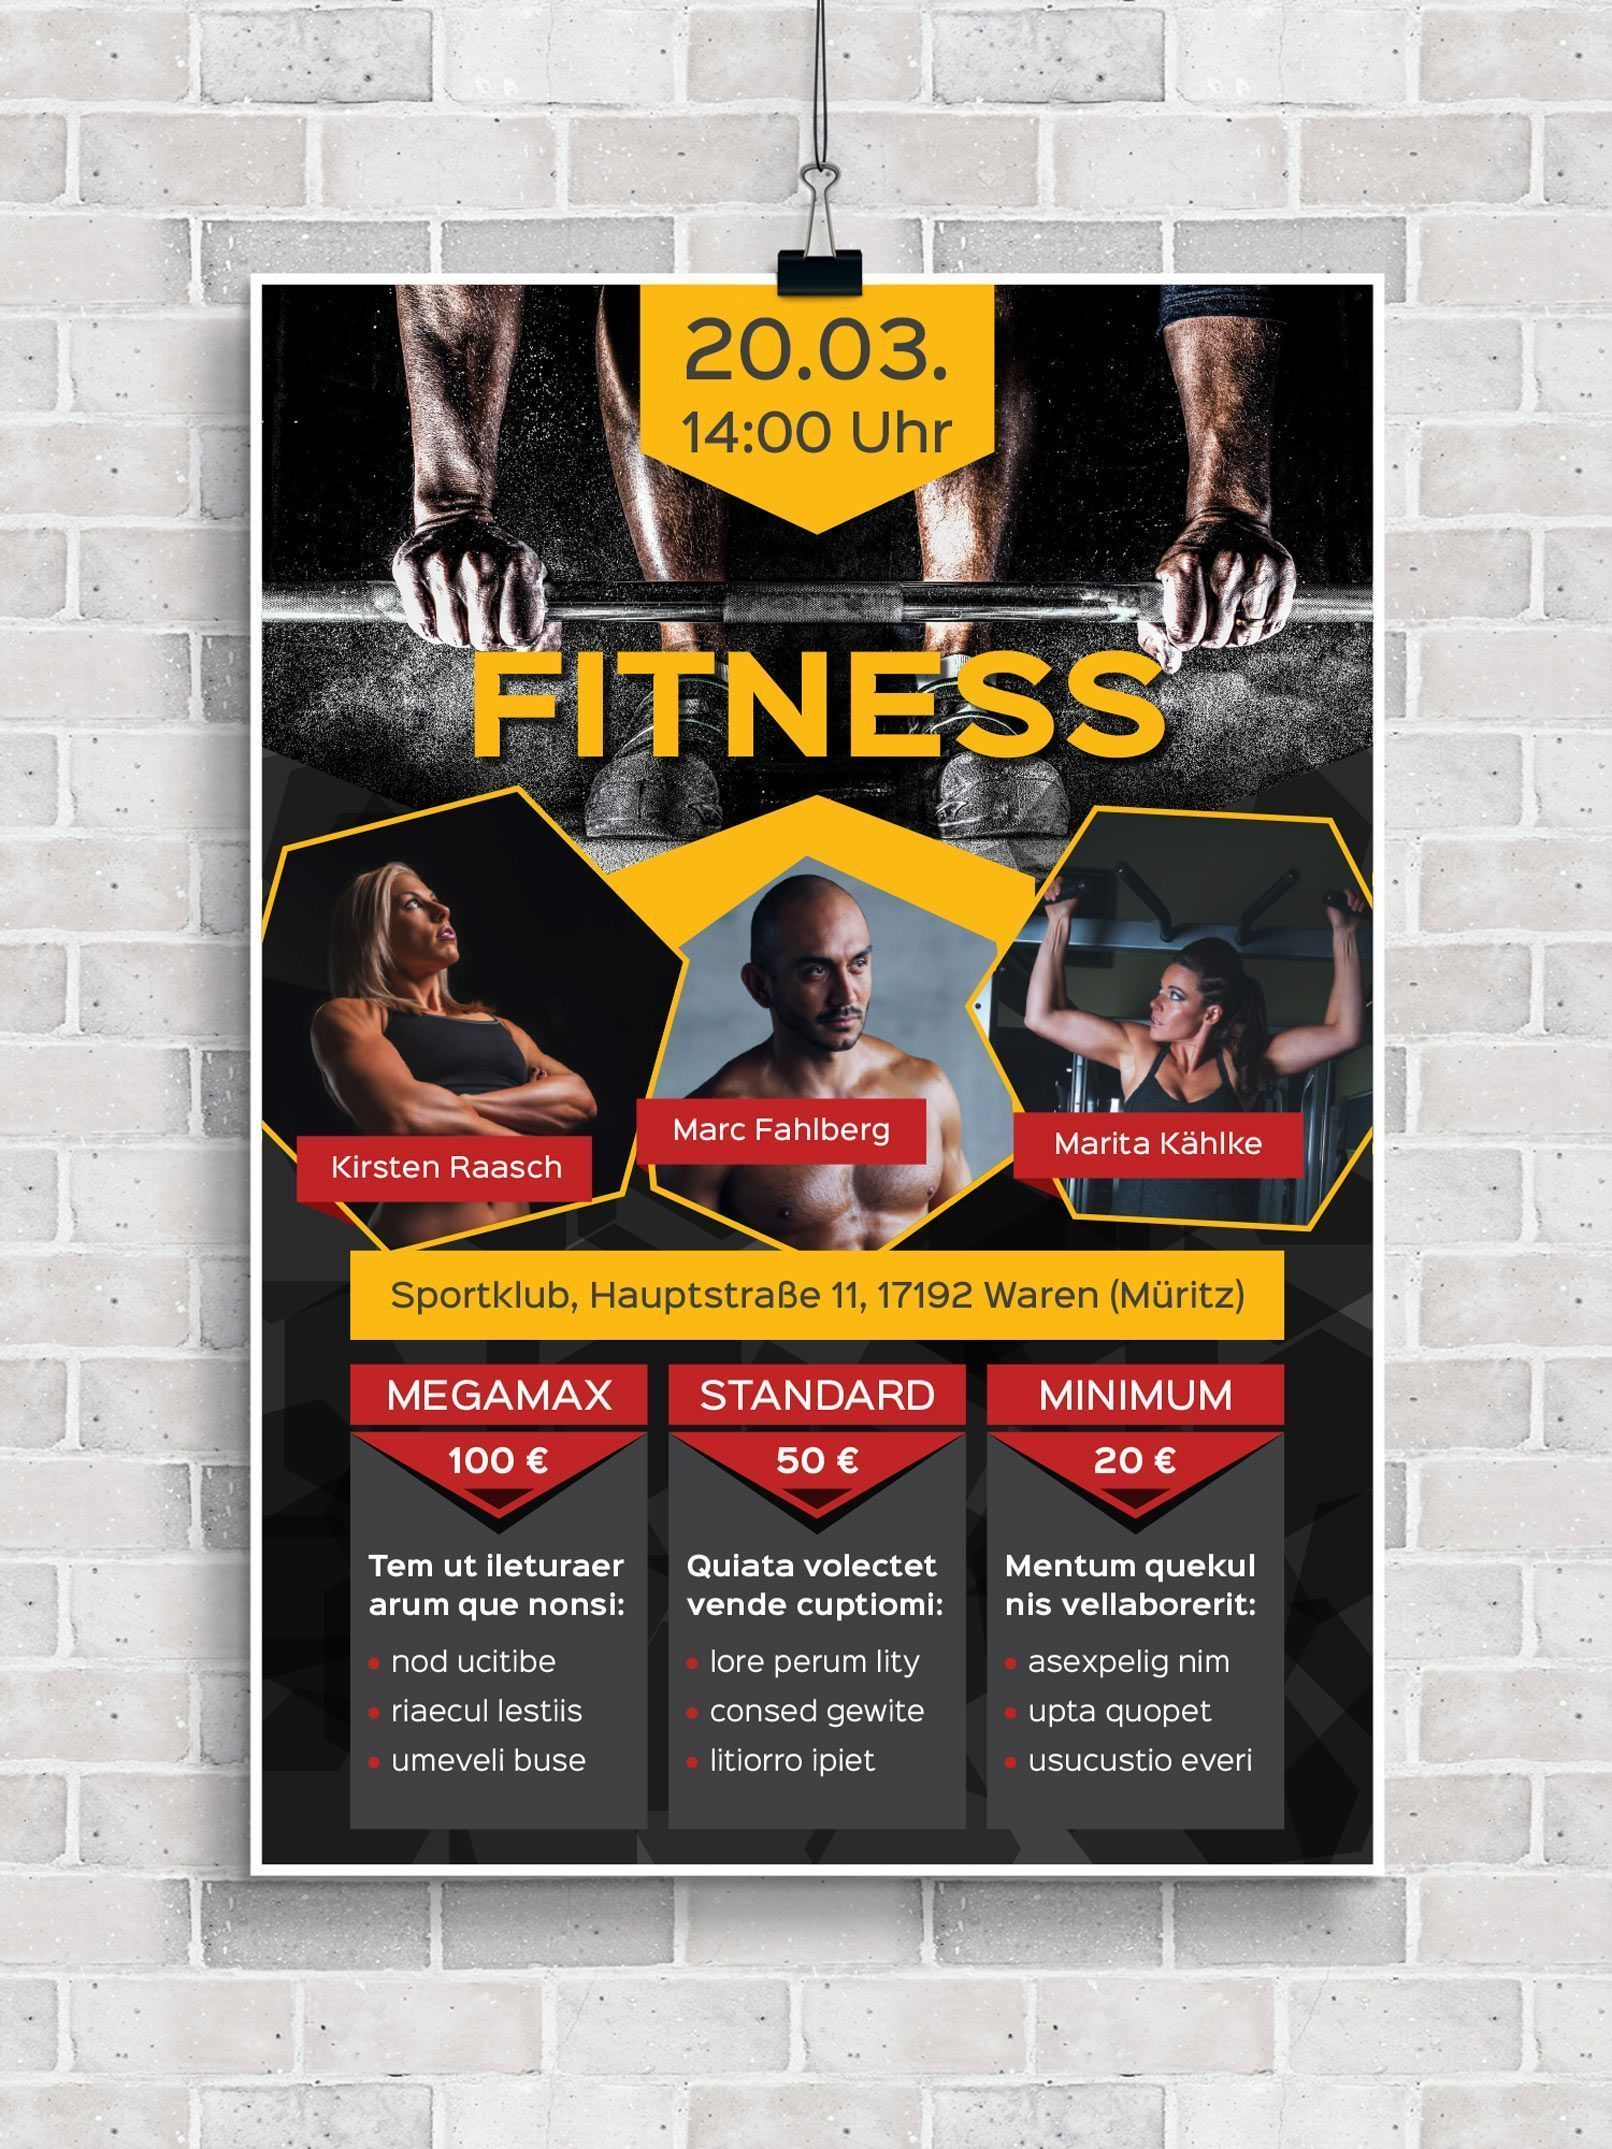 #A1Forma #fitness #fitnessstudio #fitnessstudio probetraining #Fitnessstudios #FlyerVorlagena1 #prob...